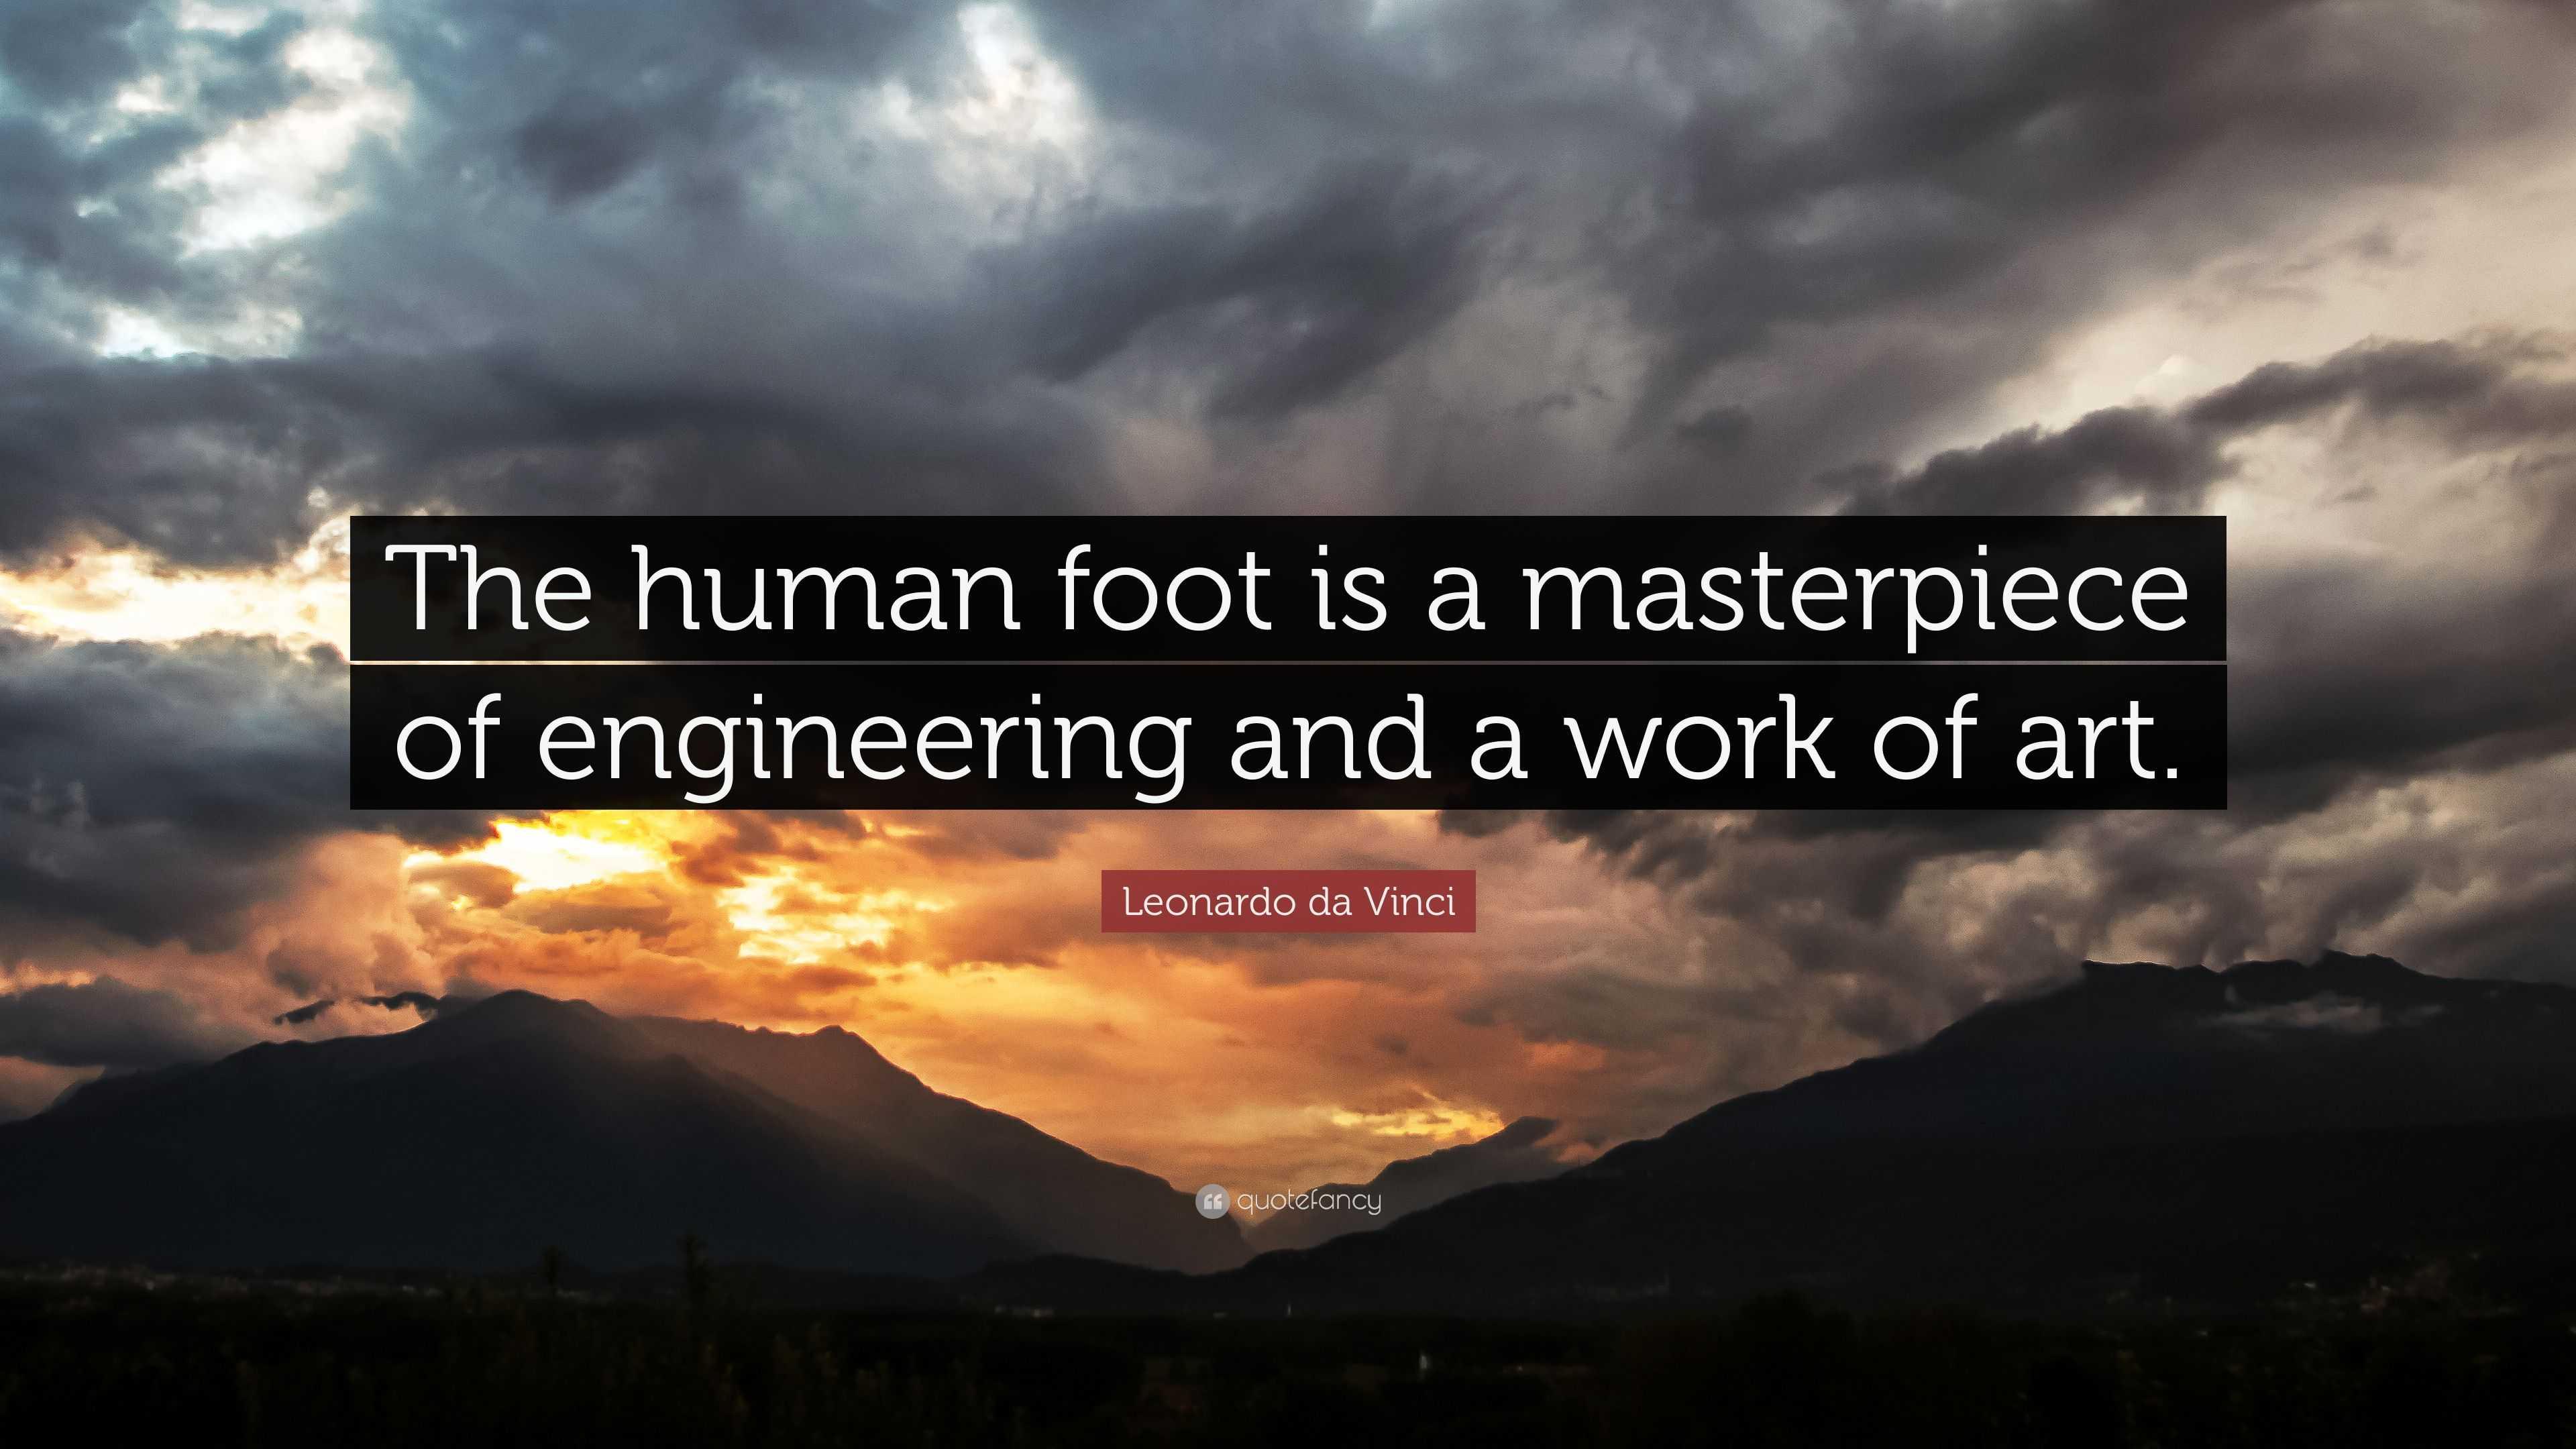 Aristotle Quotes Wallpaper Leonardo Da Vinci Quote The Human Foot Is A Masterpiece